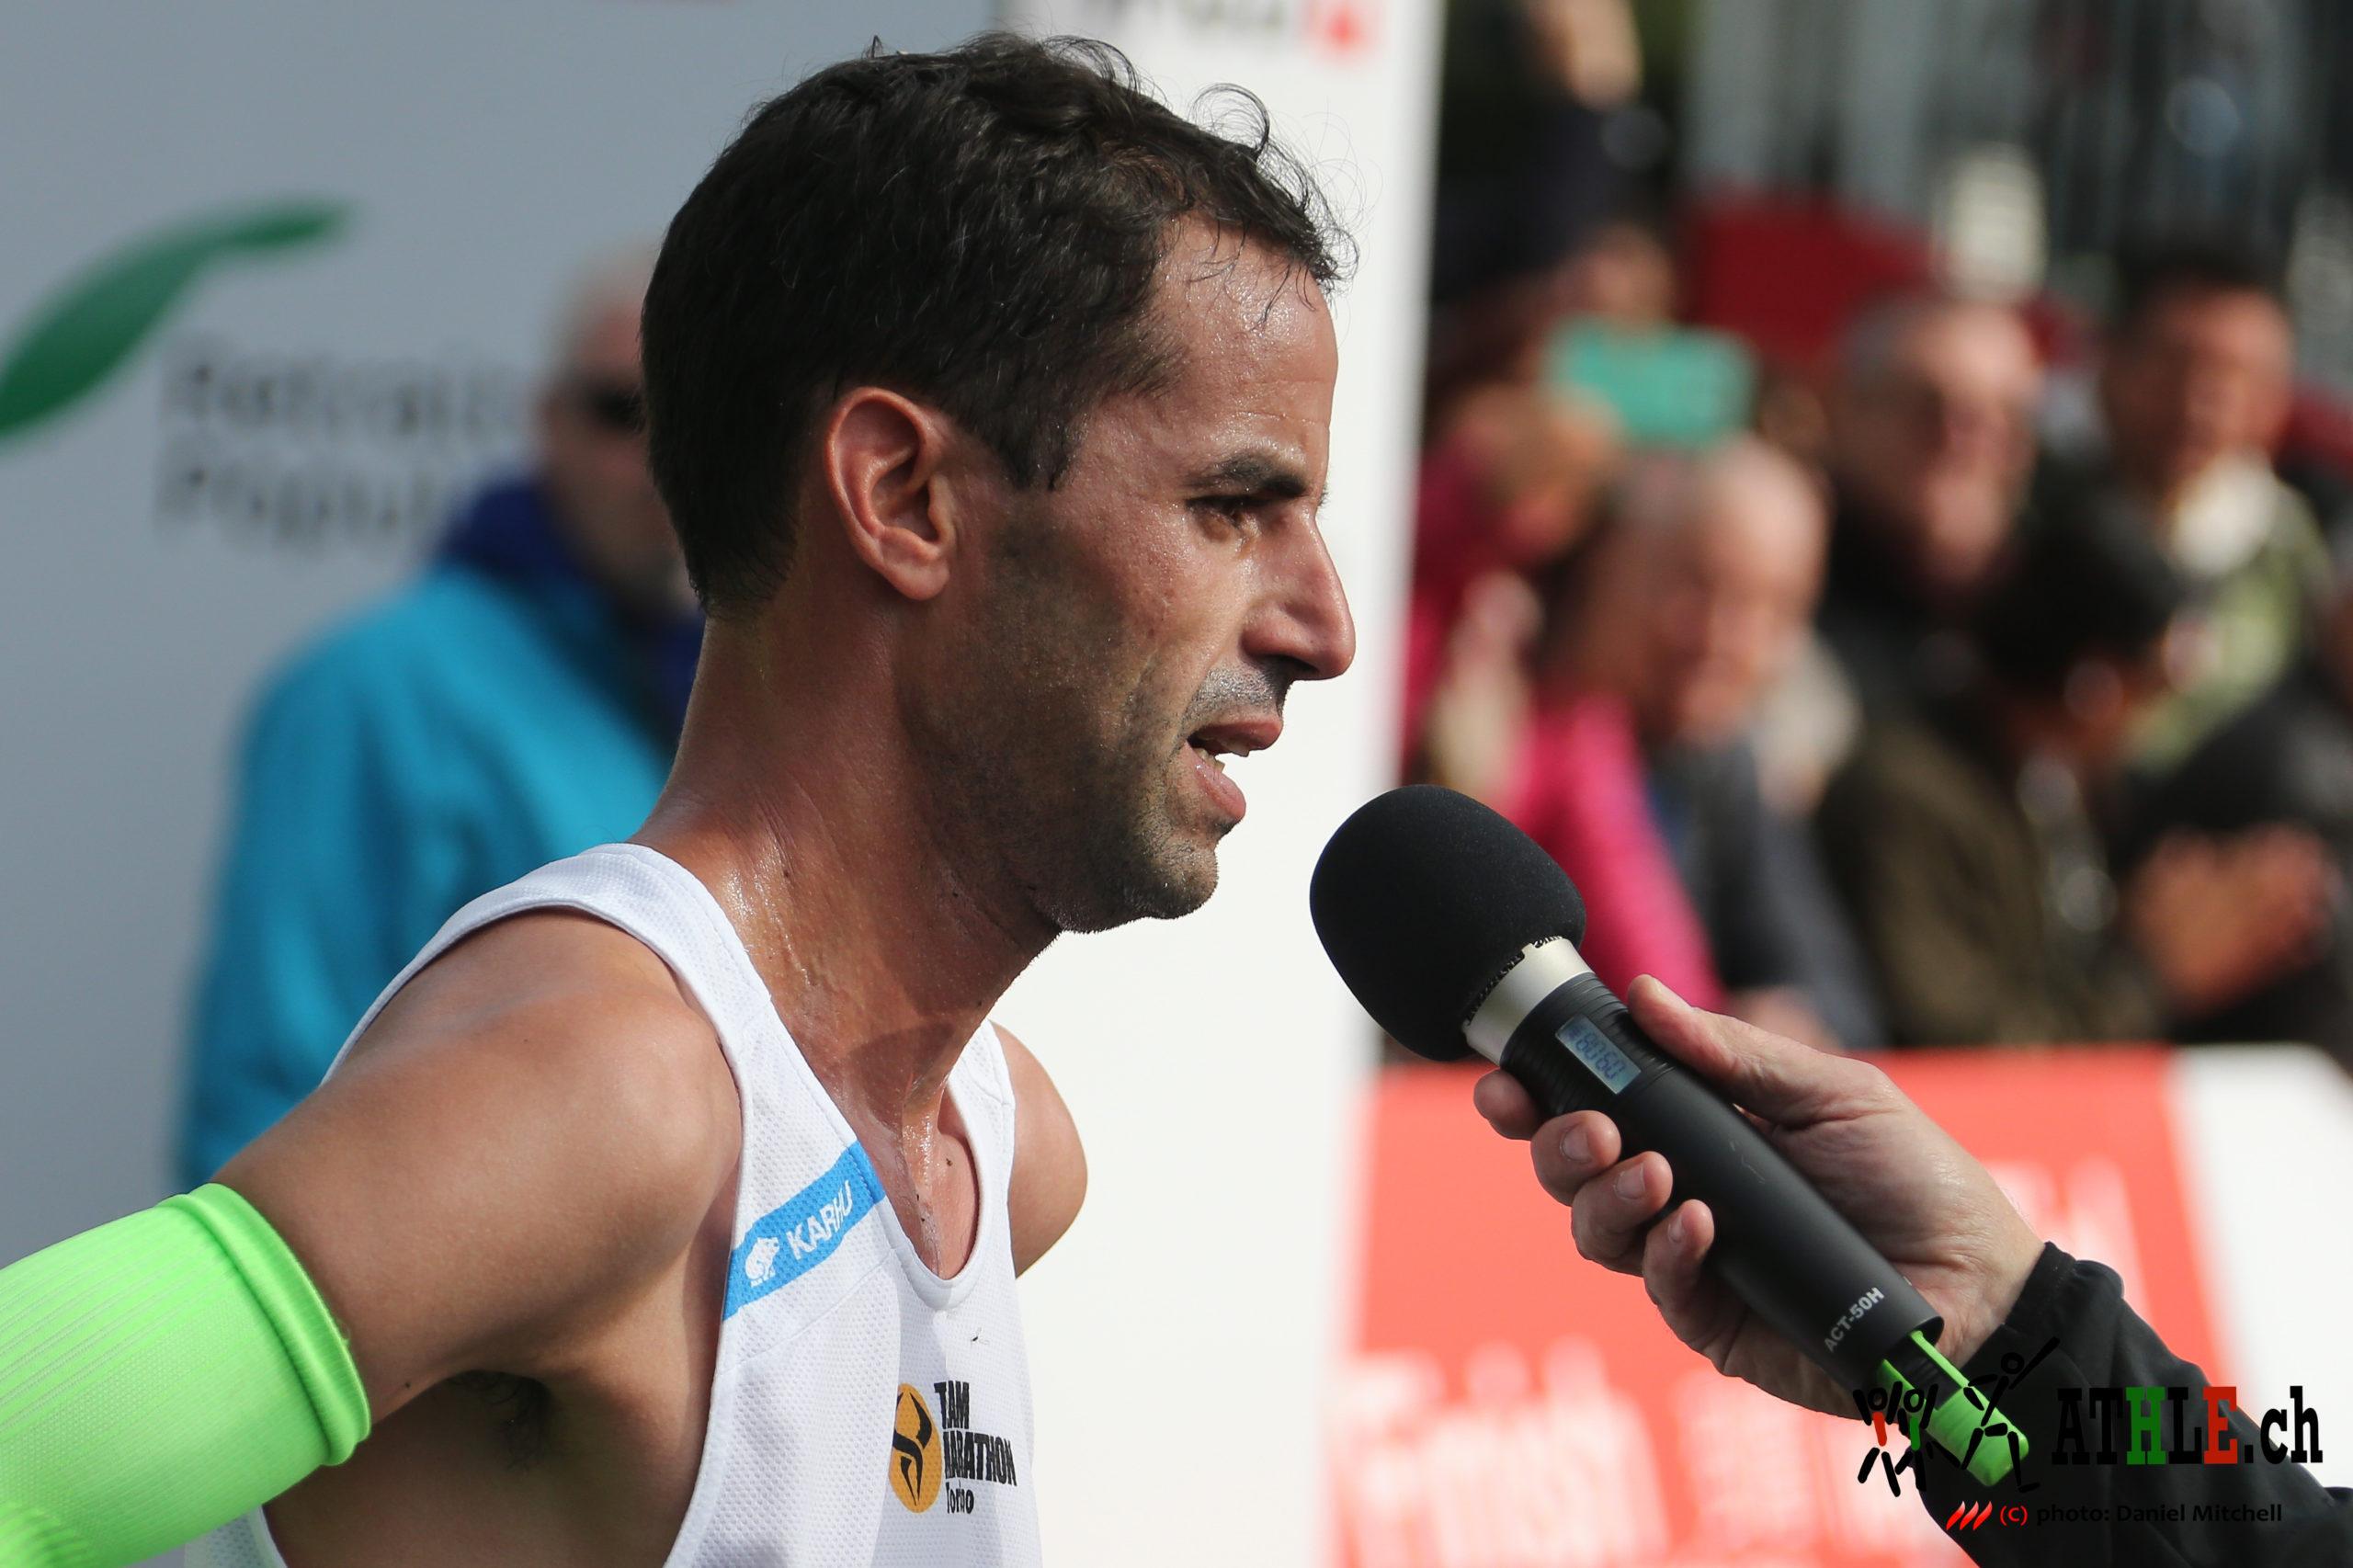 lausanne-marathon-2016-c-athle-7